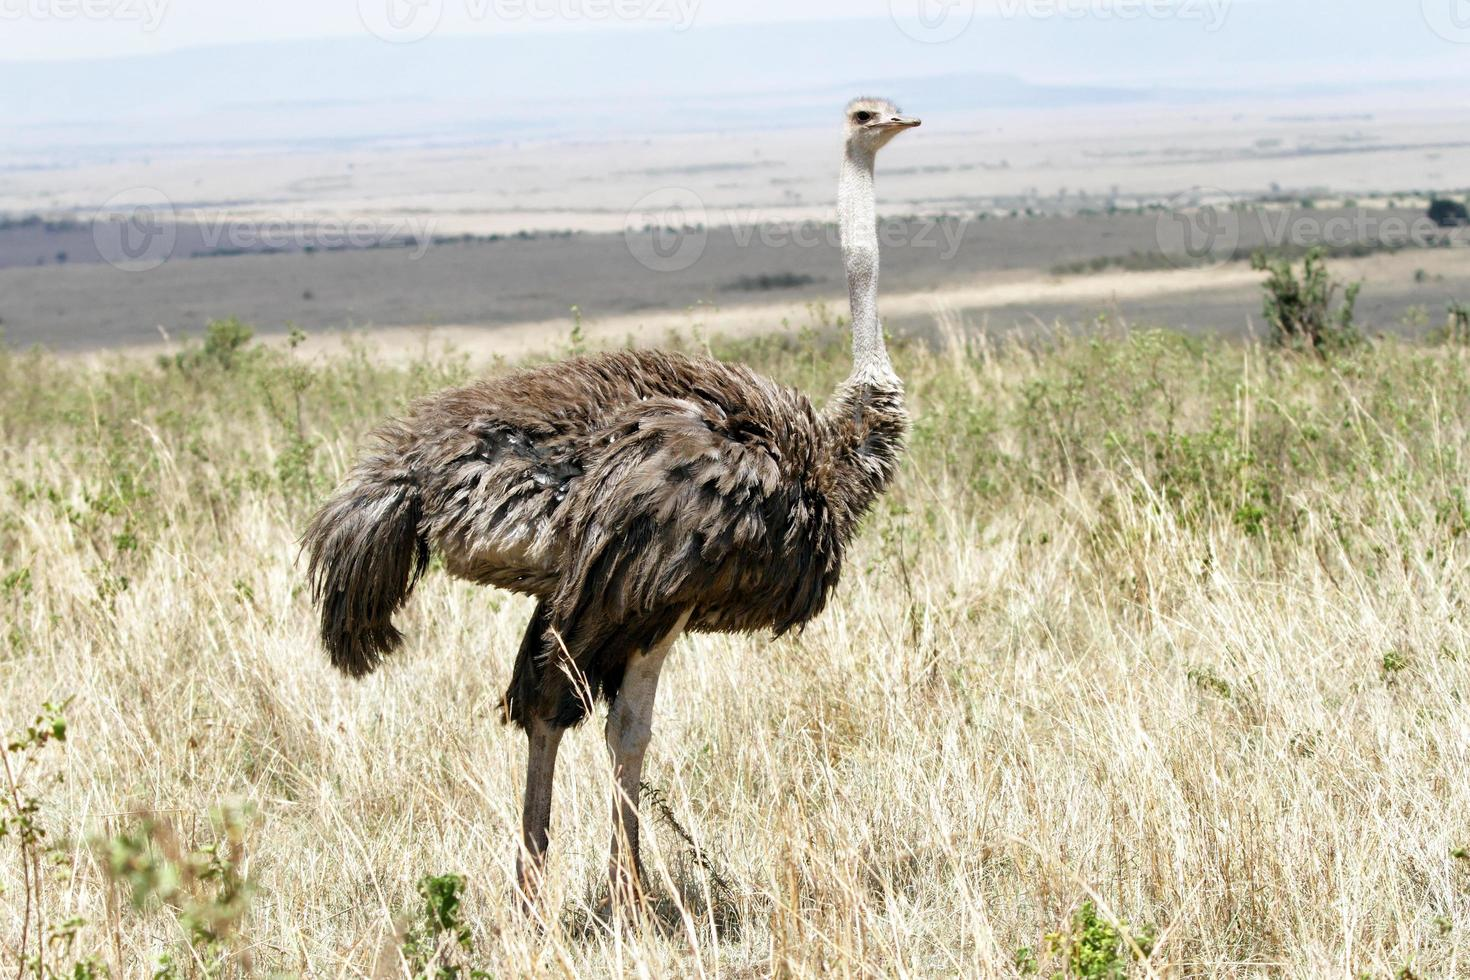 avestruz fêmea bonita, masai mara, quênia foto